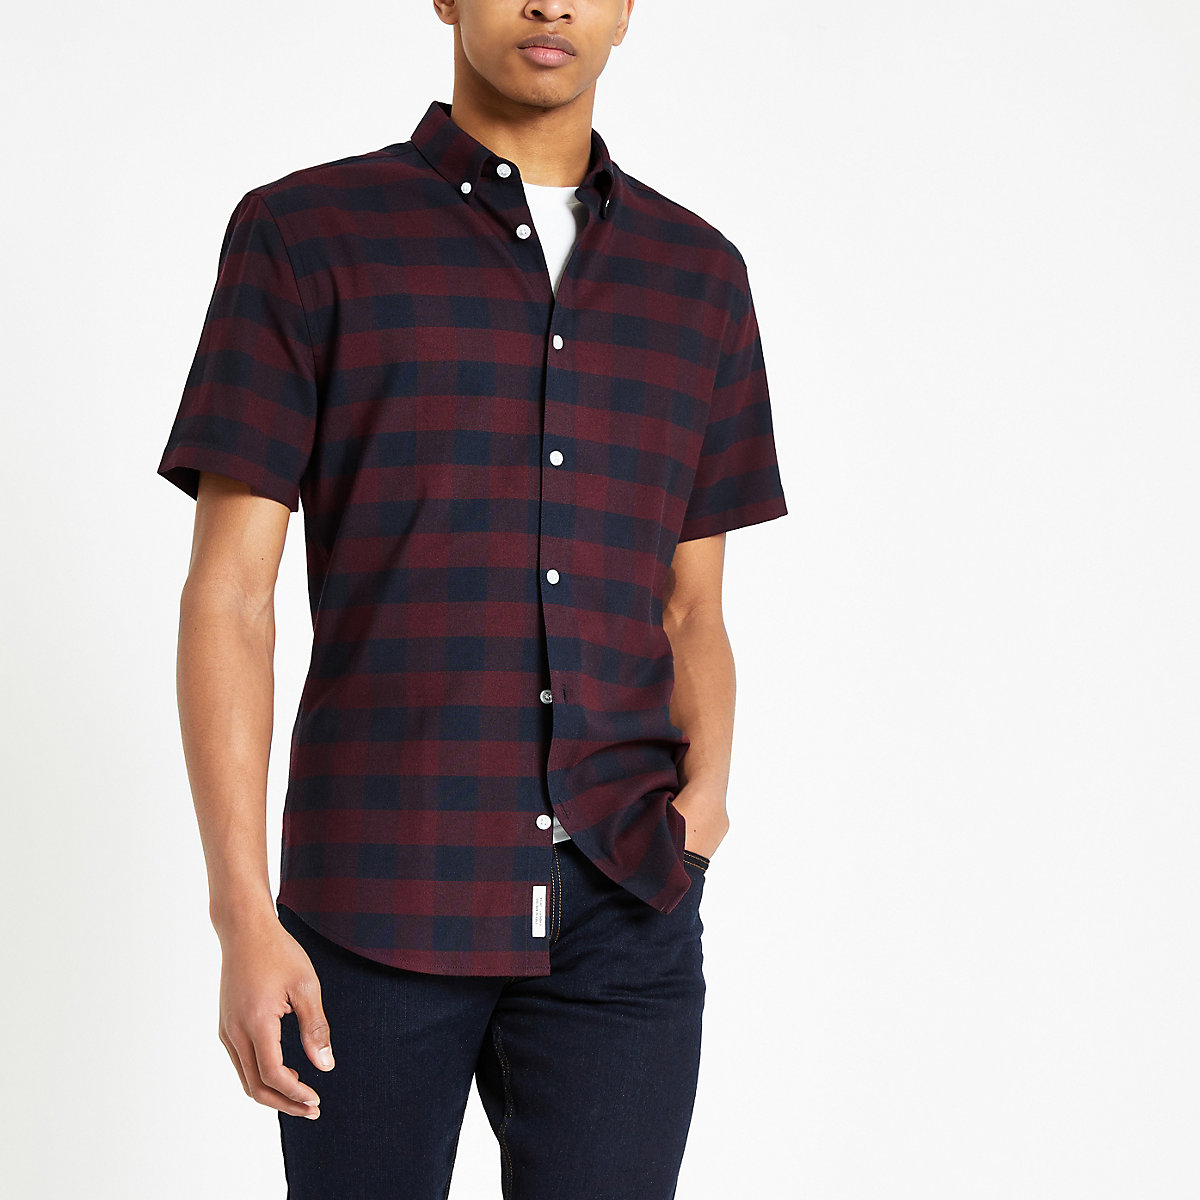 Skinny Fit Overhemd.Bordeauxrood Geruit Slim Fit Overhemd Met Korte Mouwen Overhemden